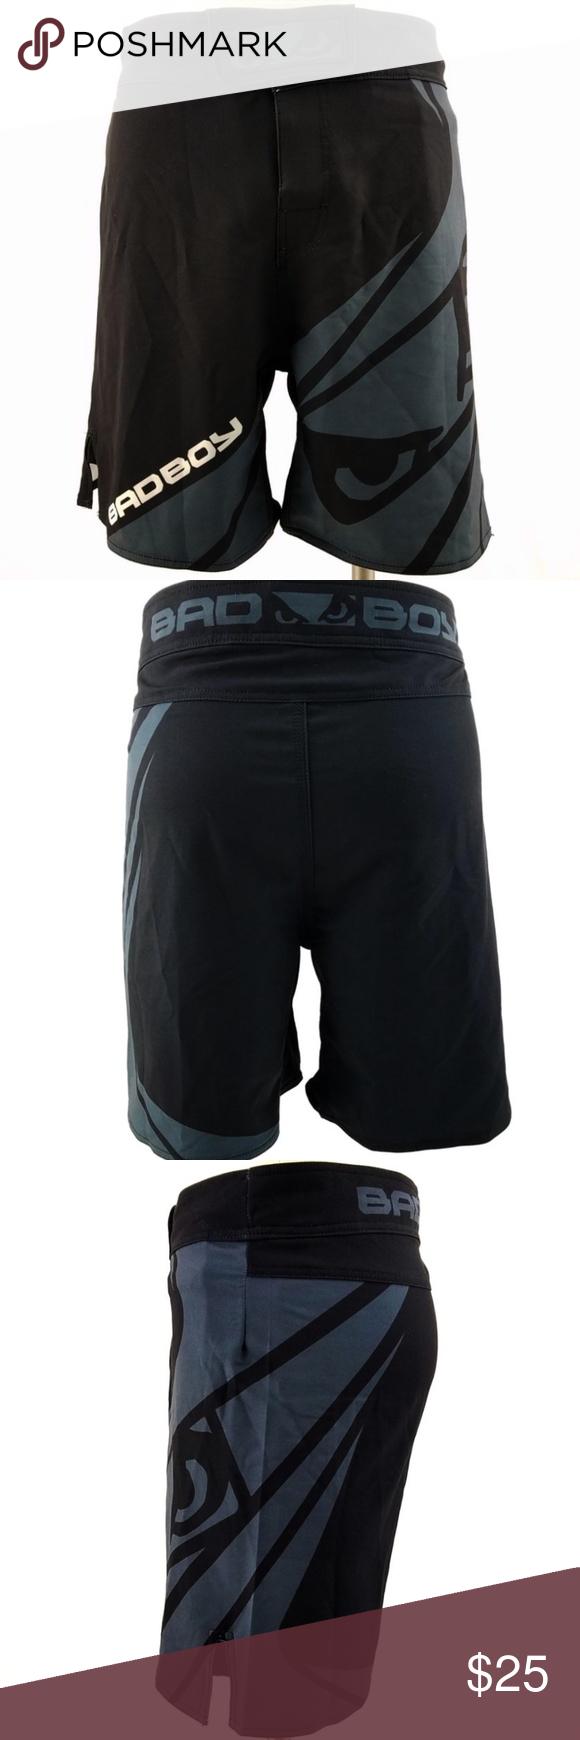 763db5b56 Bad Boy Velocity Black/Grey Stretch Fight Shorts Built-in mouth guard  pocket Graphics